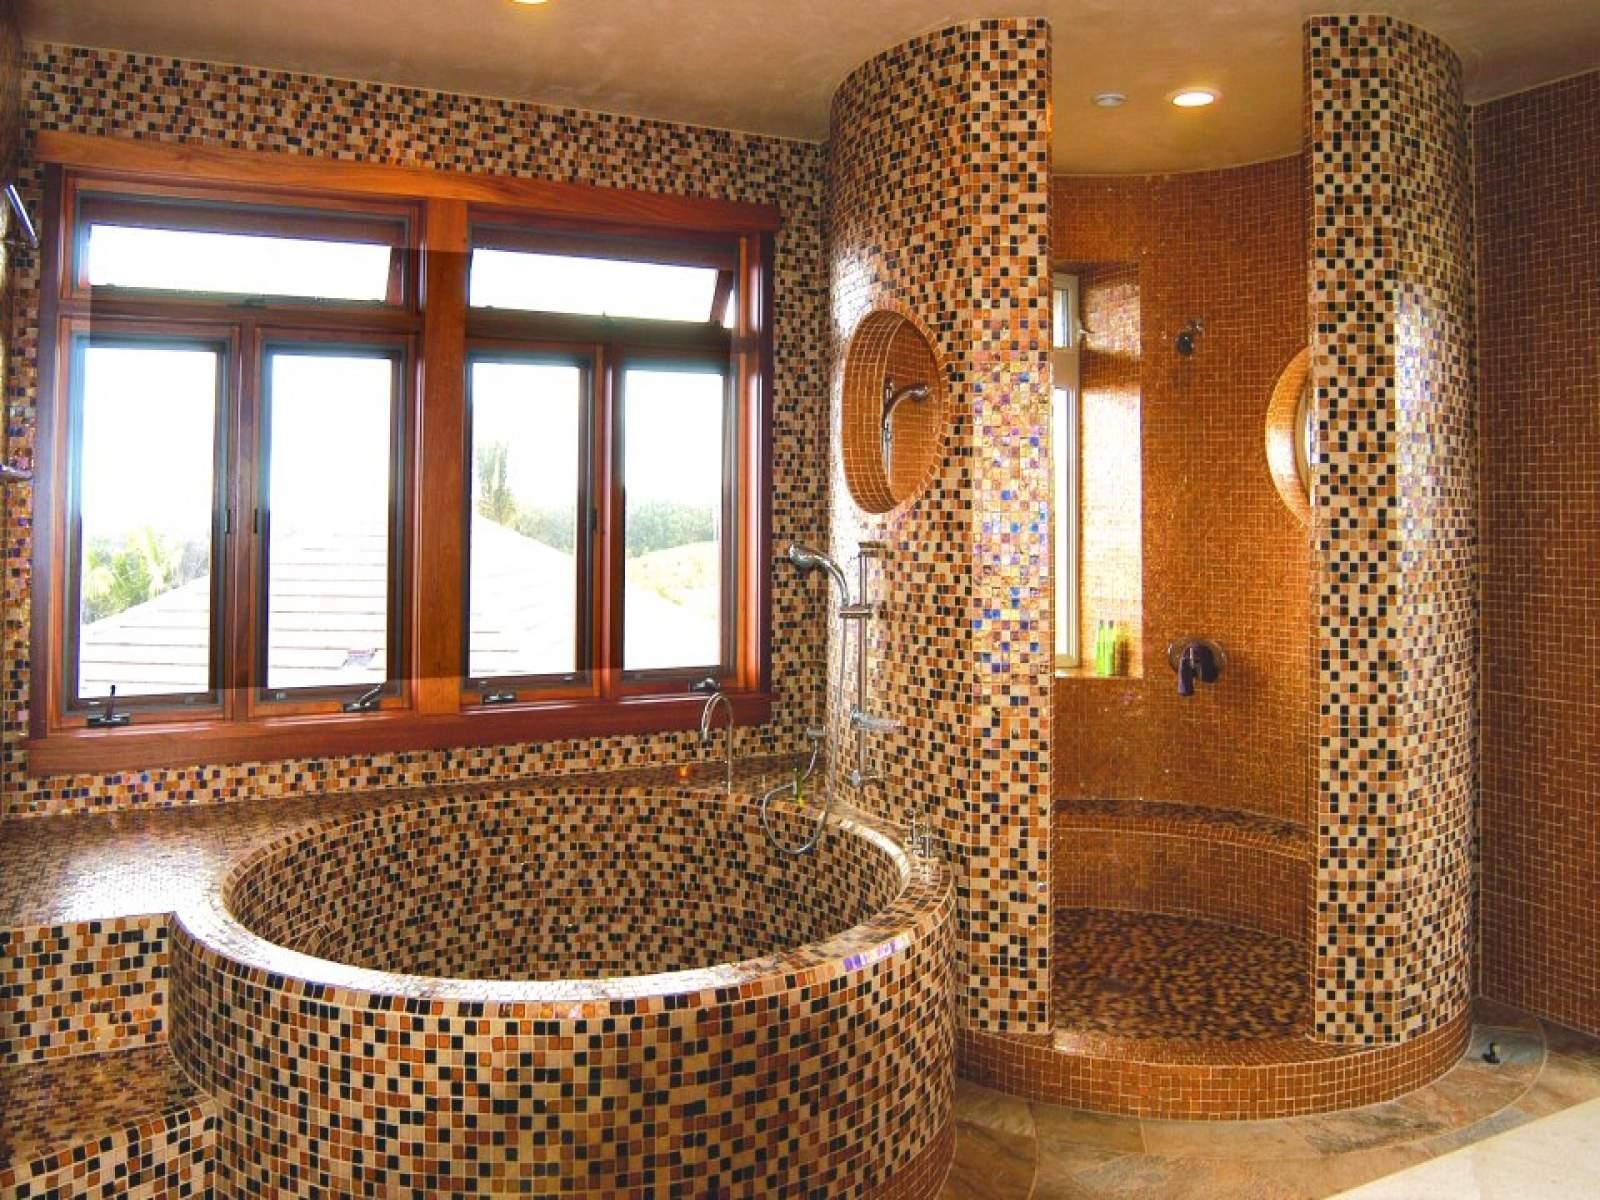 Мозаика своими руками в ванной комнате фото в 17